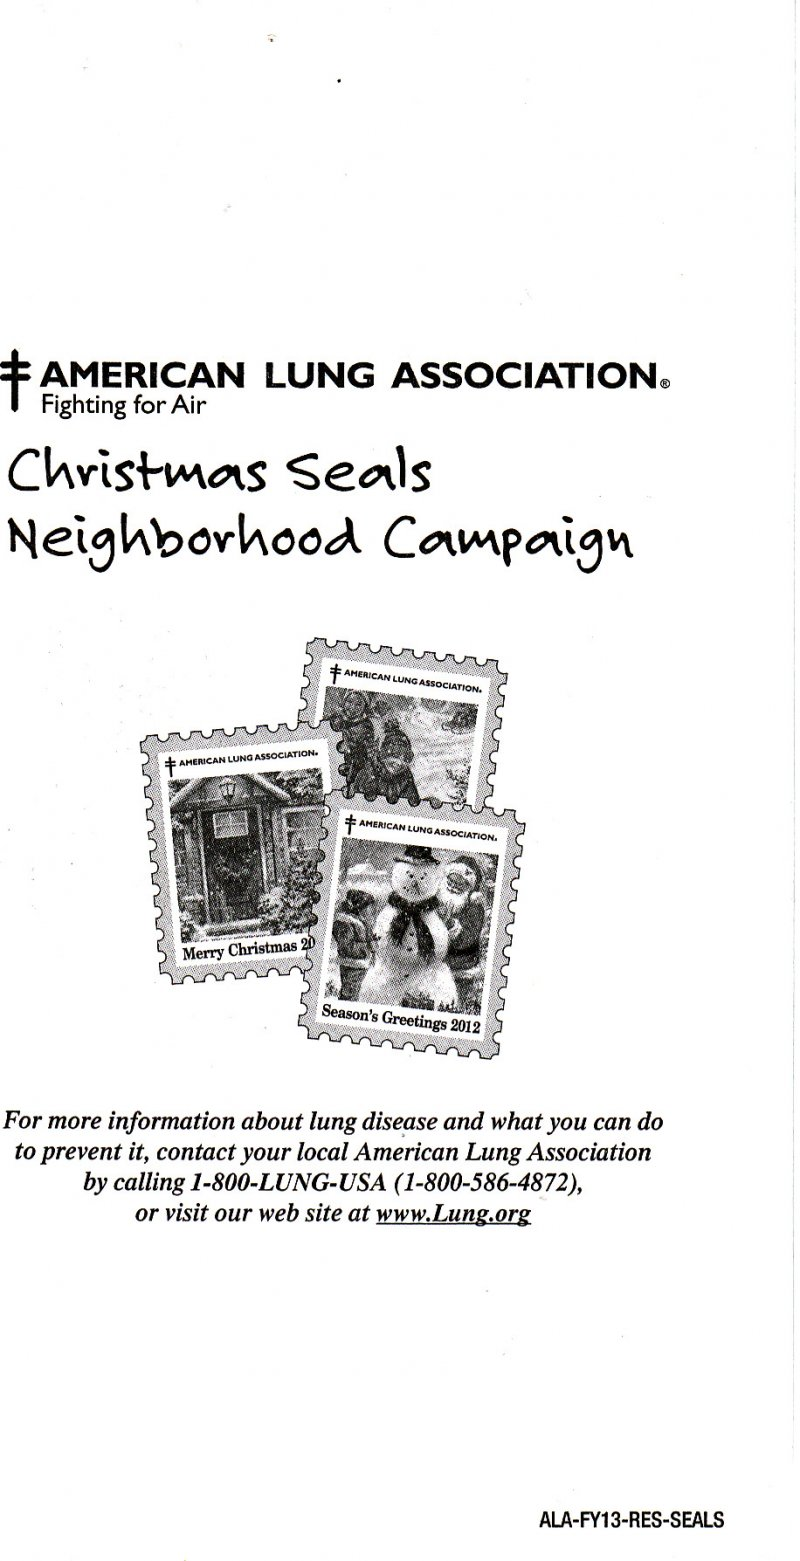 2012-1x11, 2012 U.S. National Christmas Seals Pane, ALA-FY13-RES-SEALS, back of pane